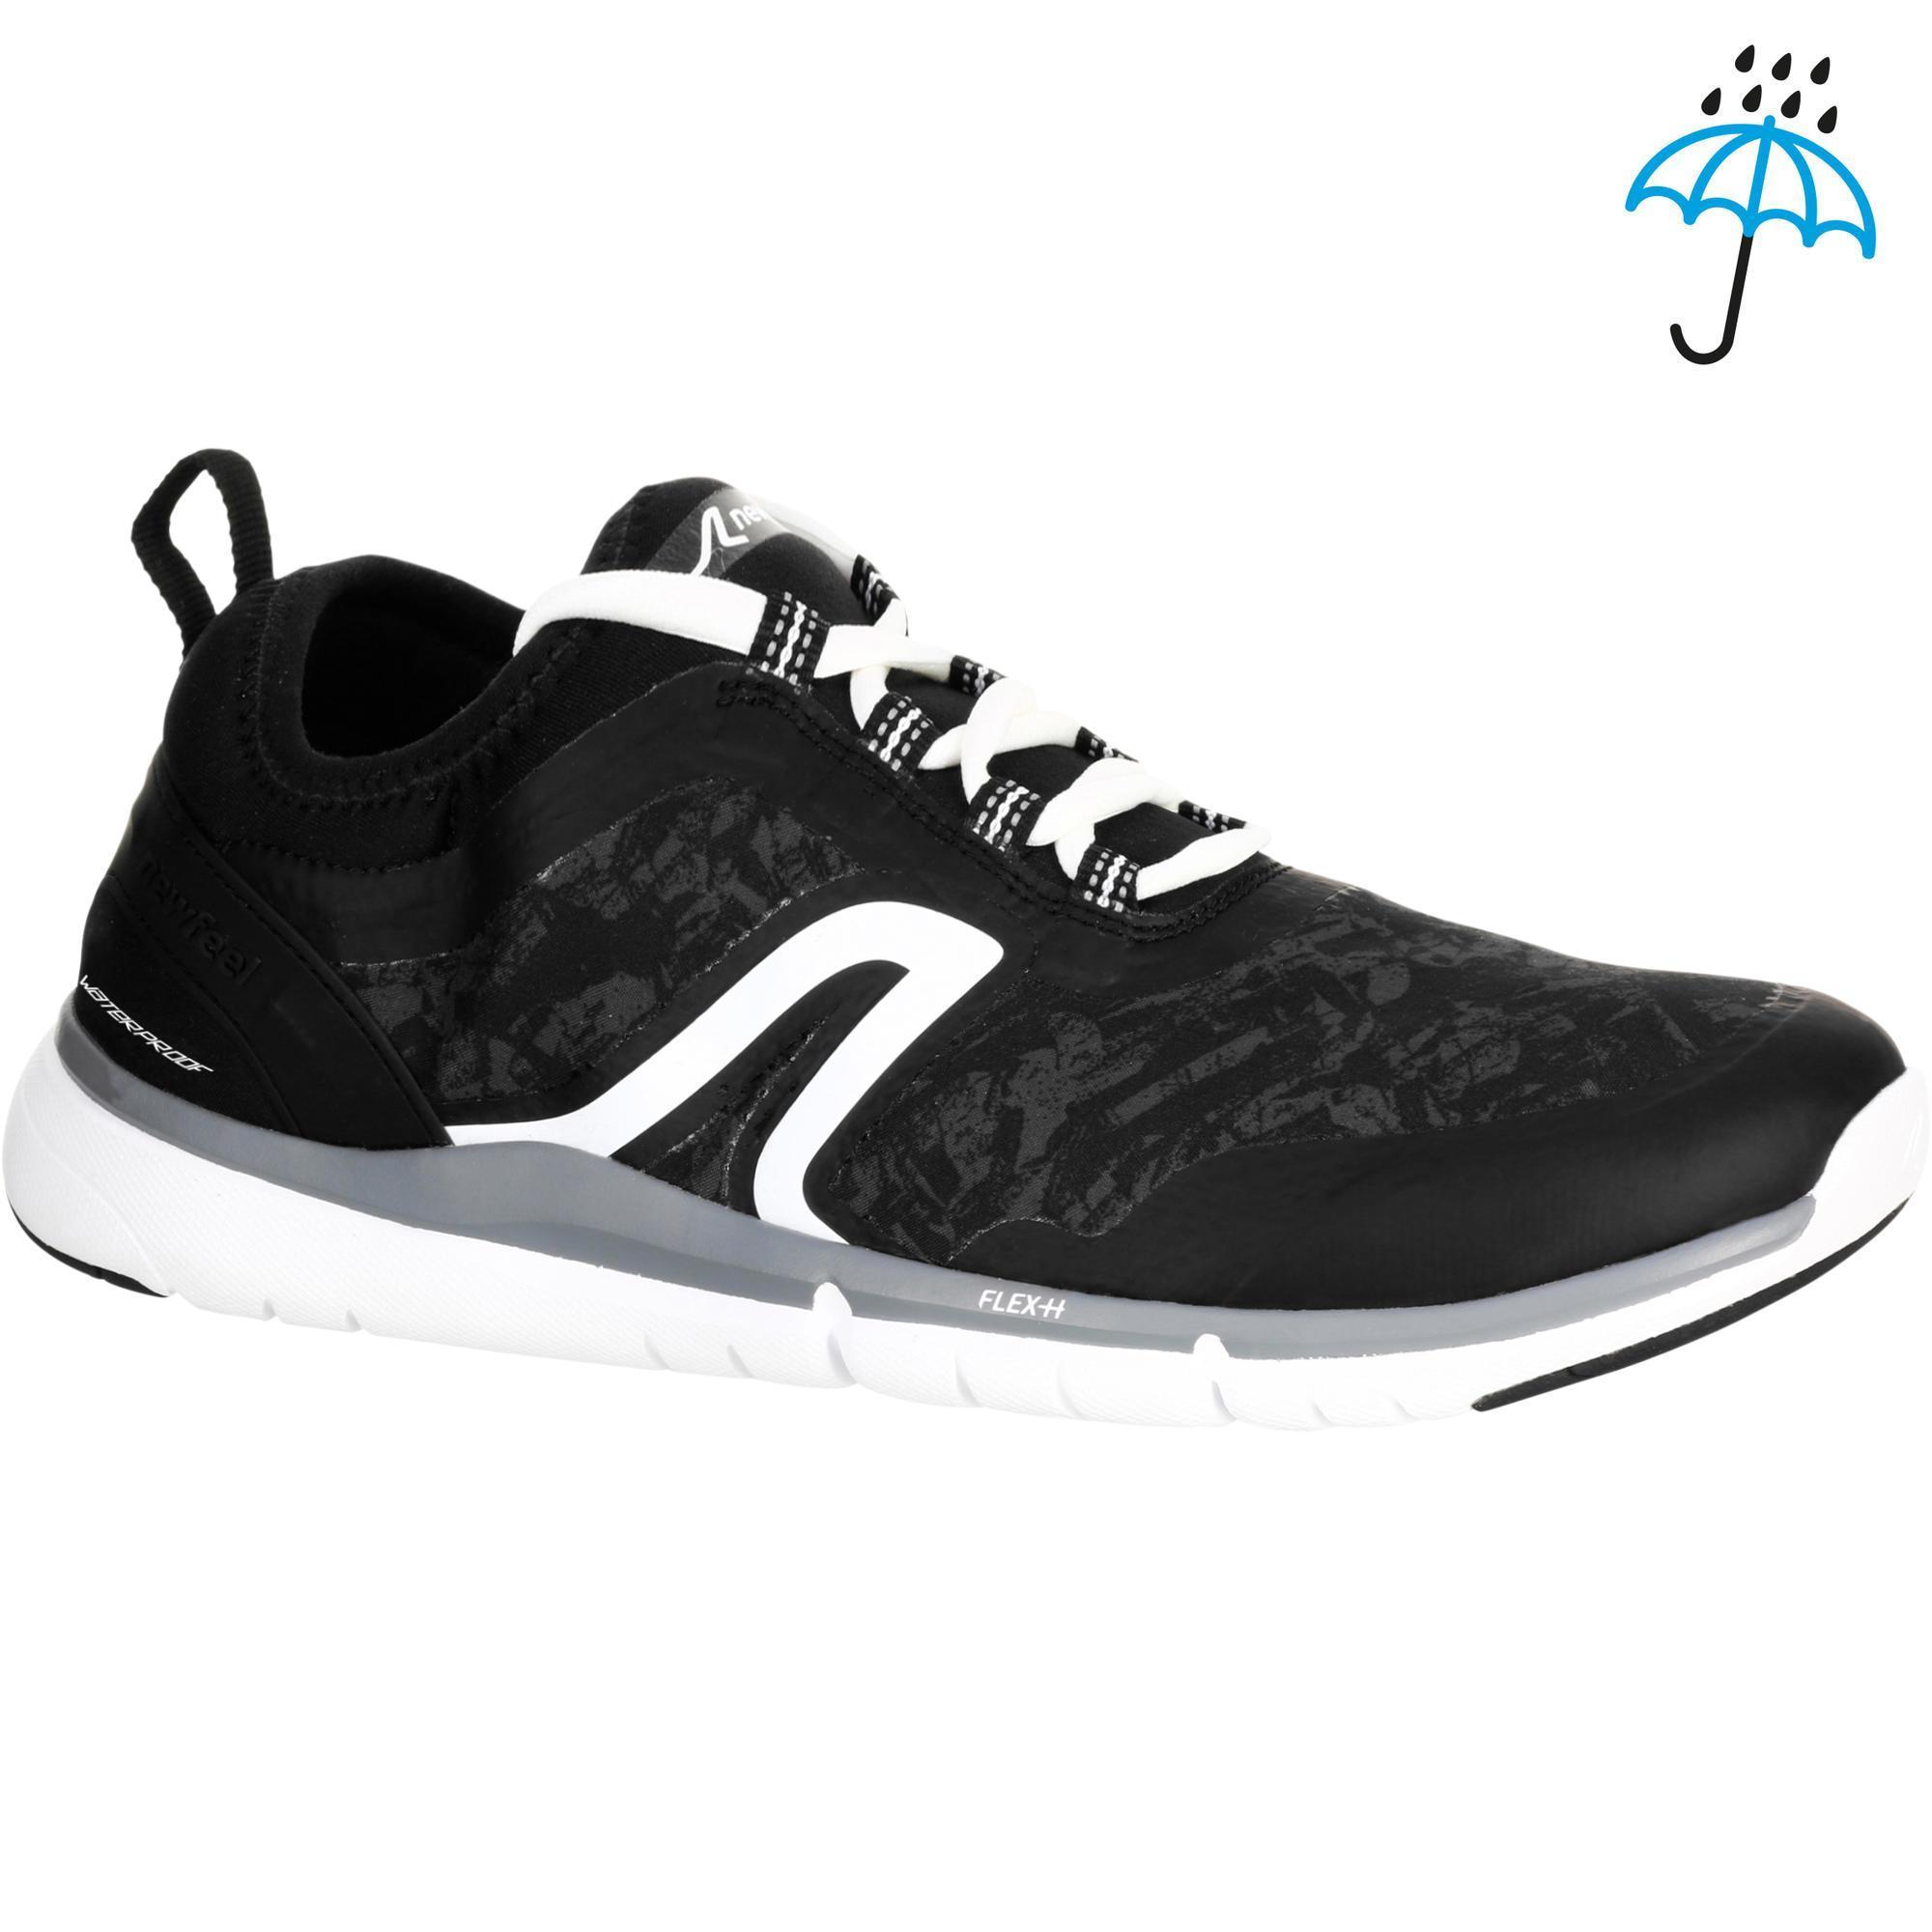 chaussures marche sportive homme pw 580 plasmadry noir newfeel. Black Bedroom Furniture Sets. Home Design Ideas